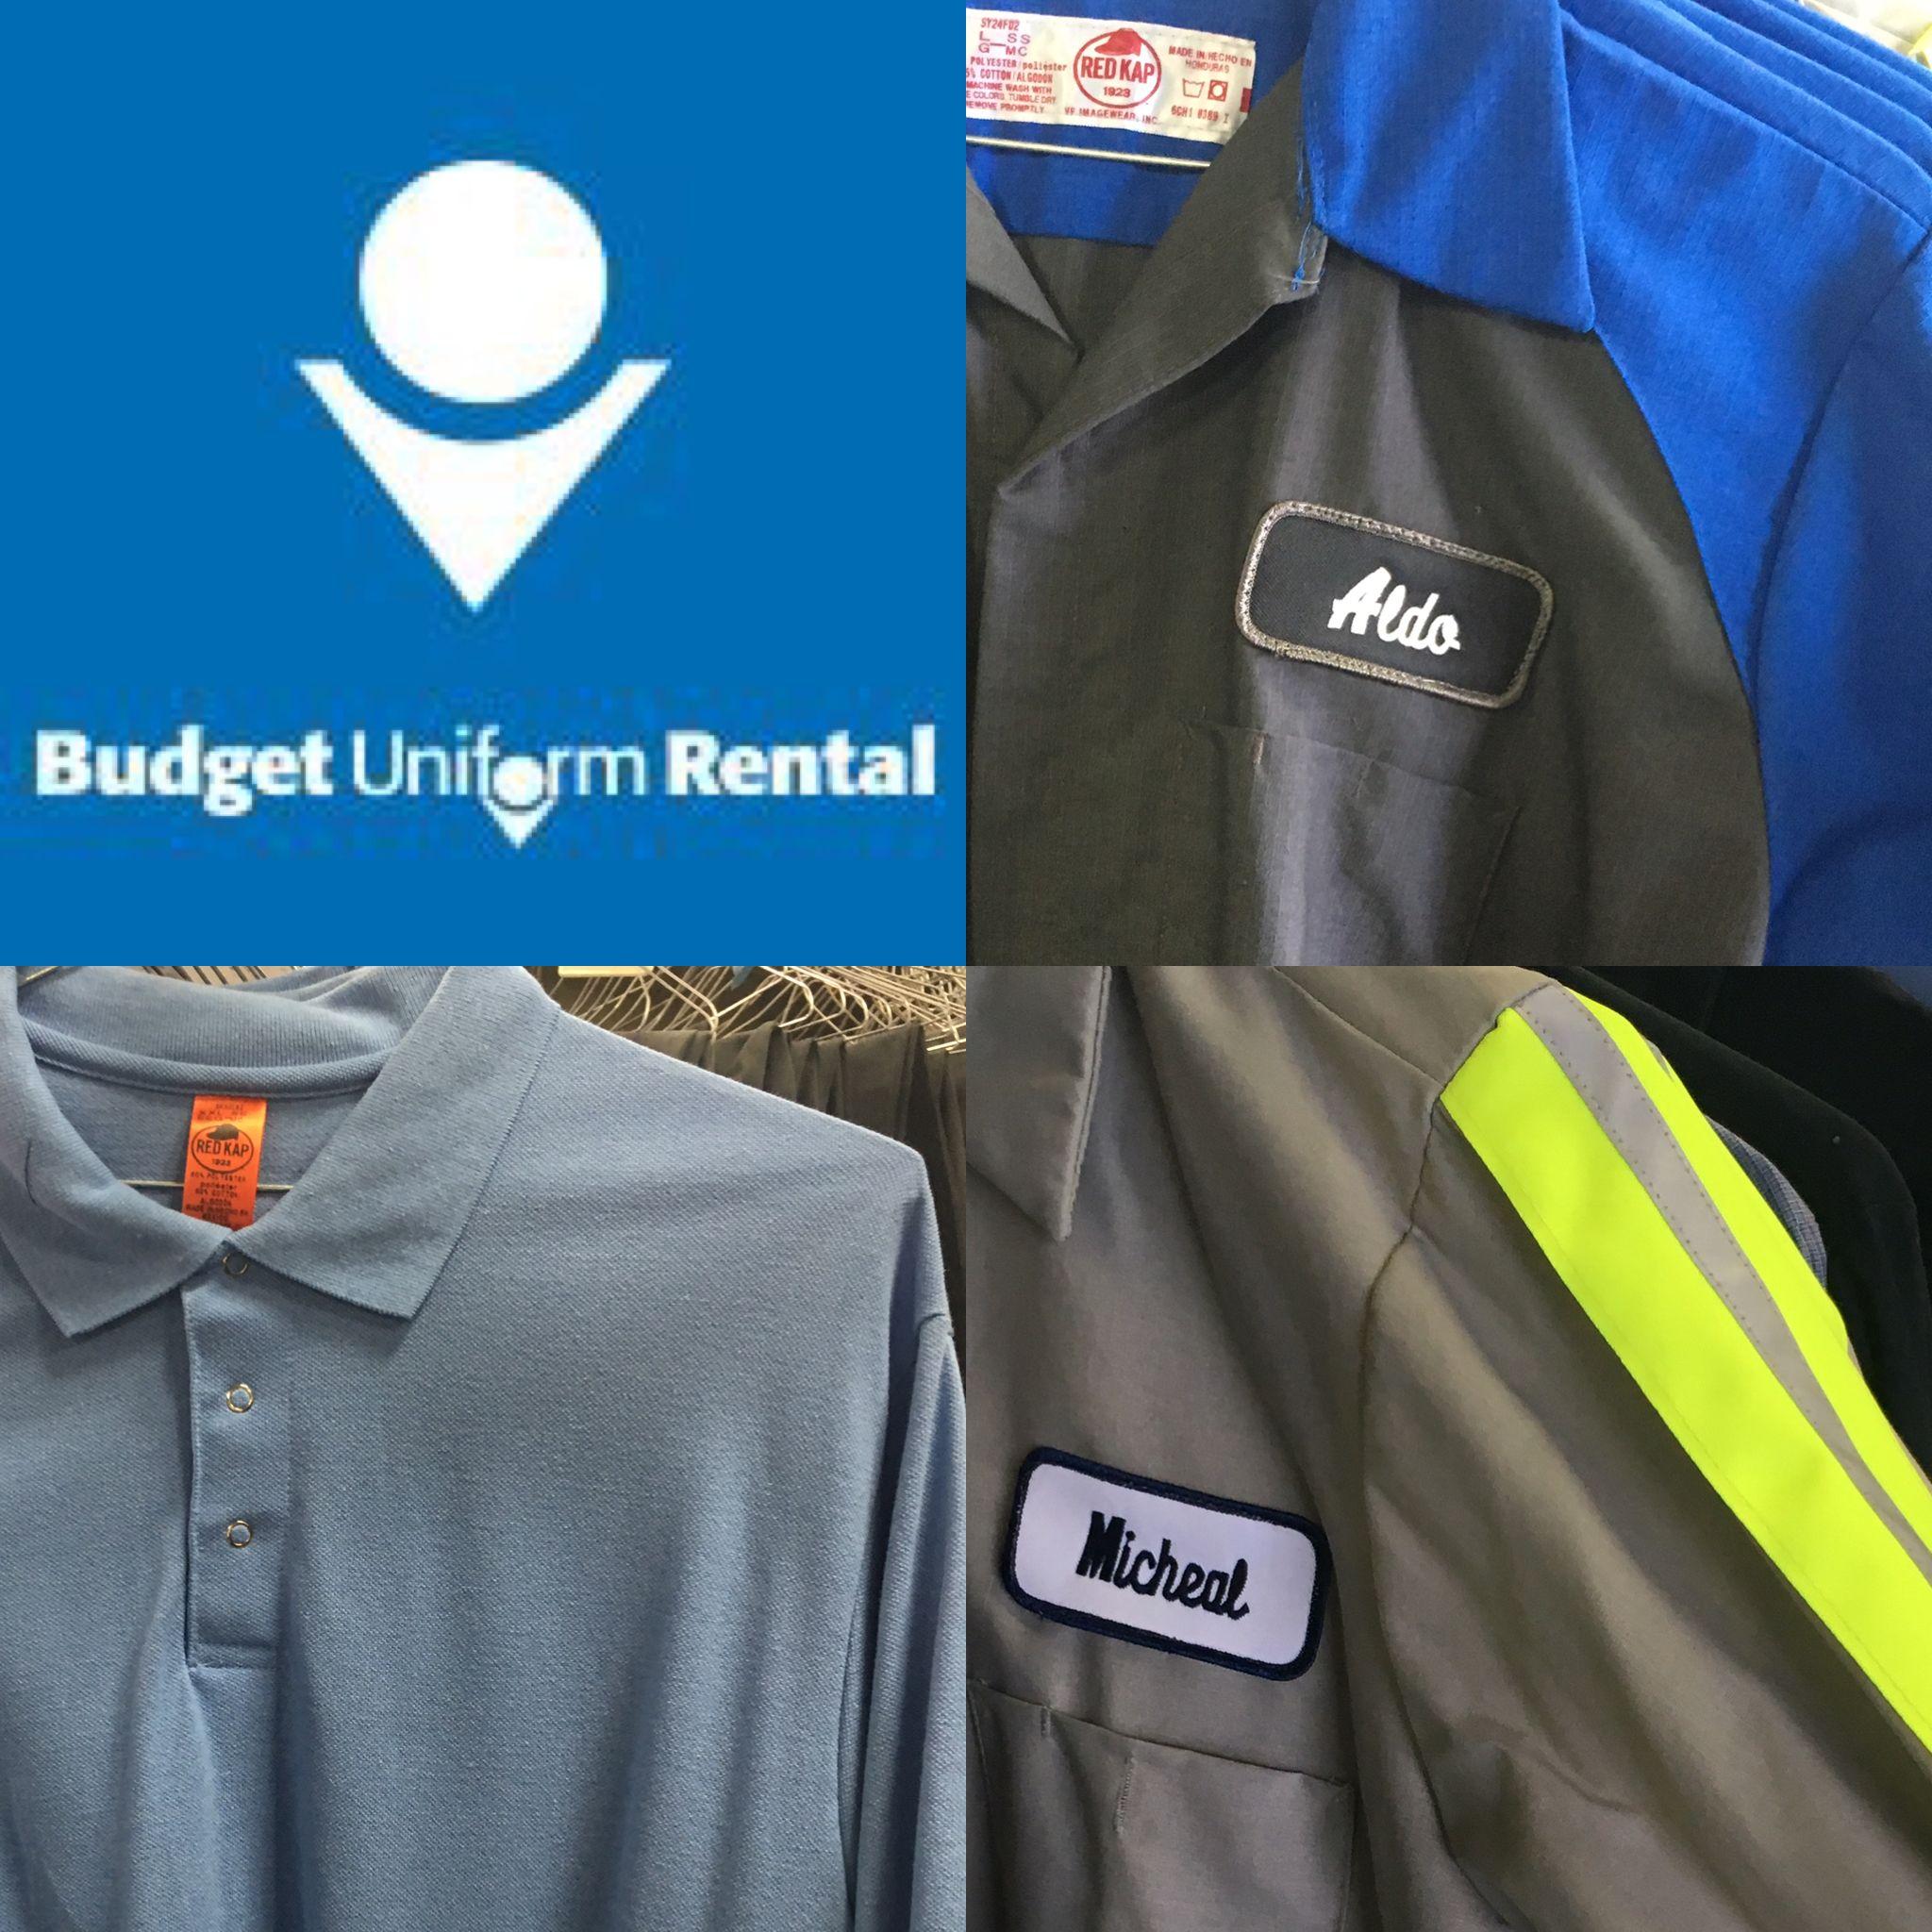 Uniforms for Rent